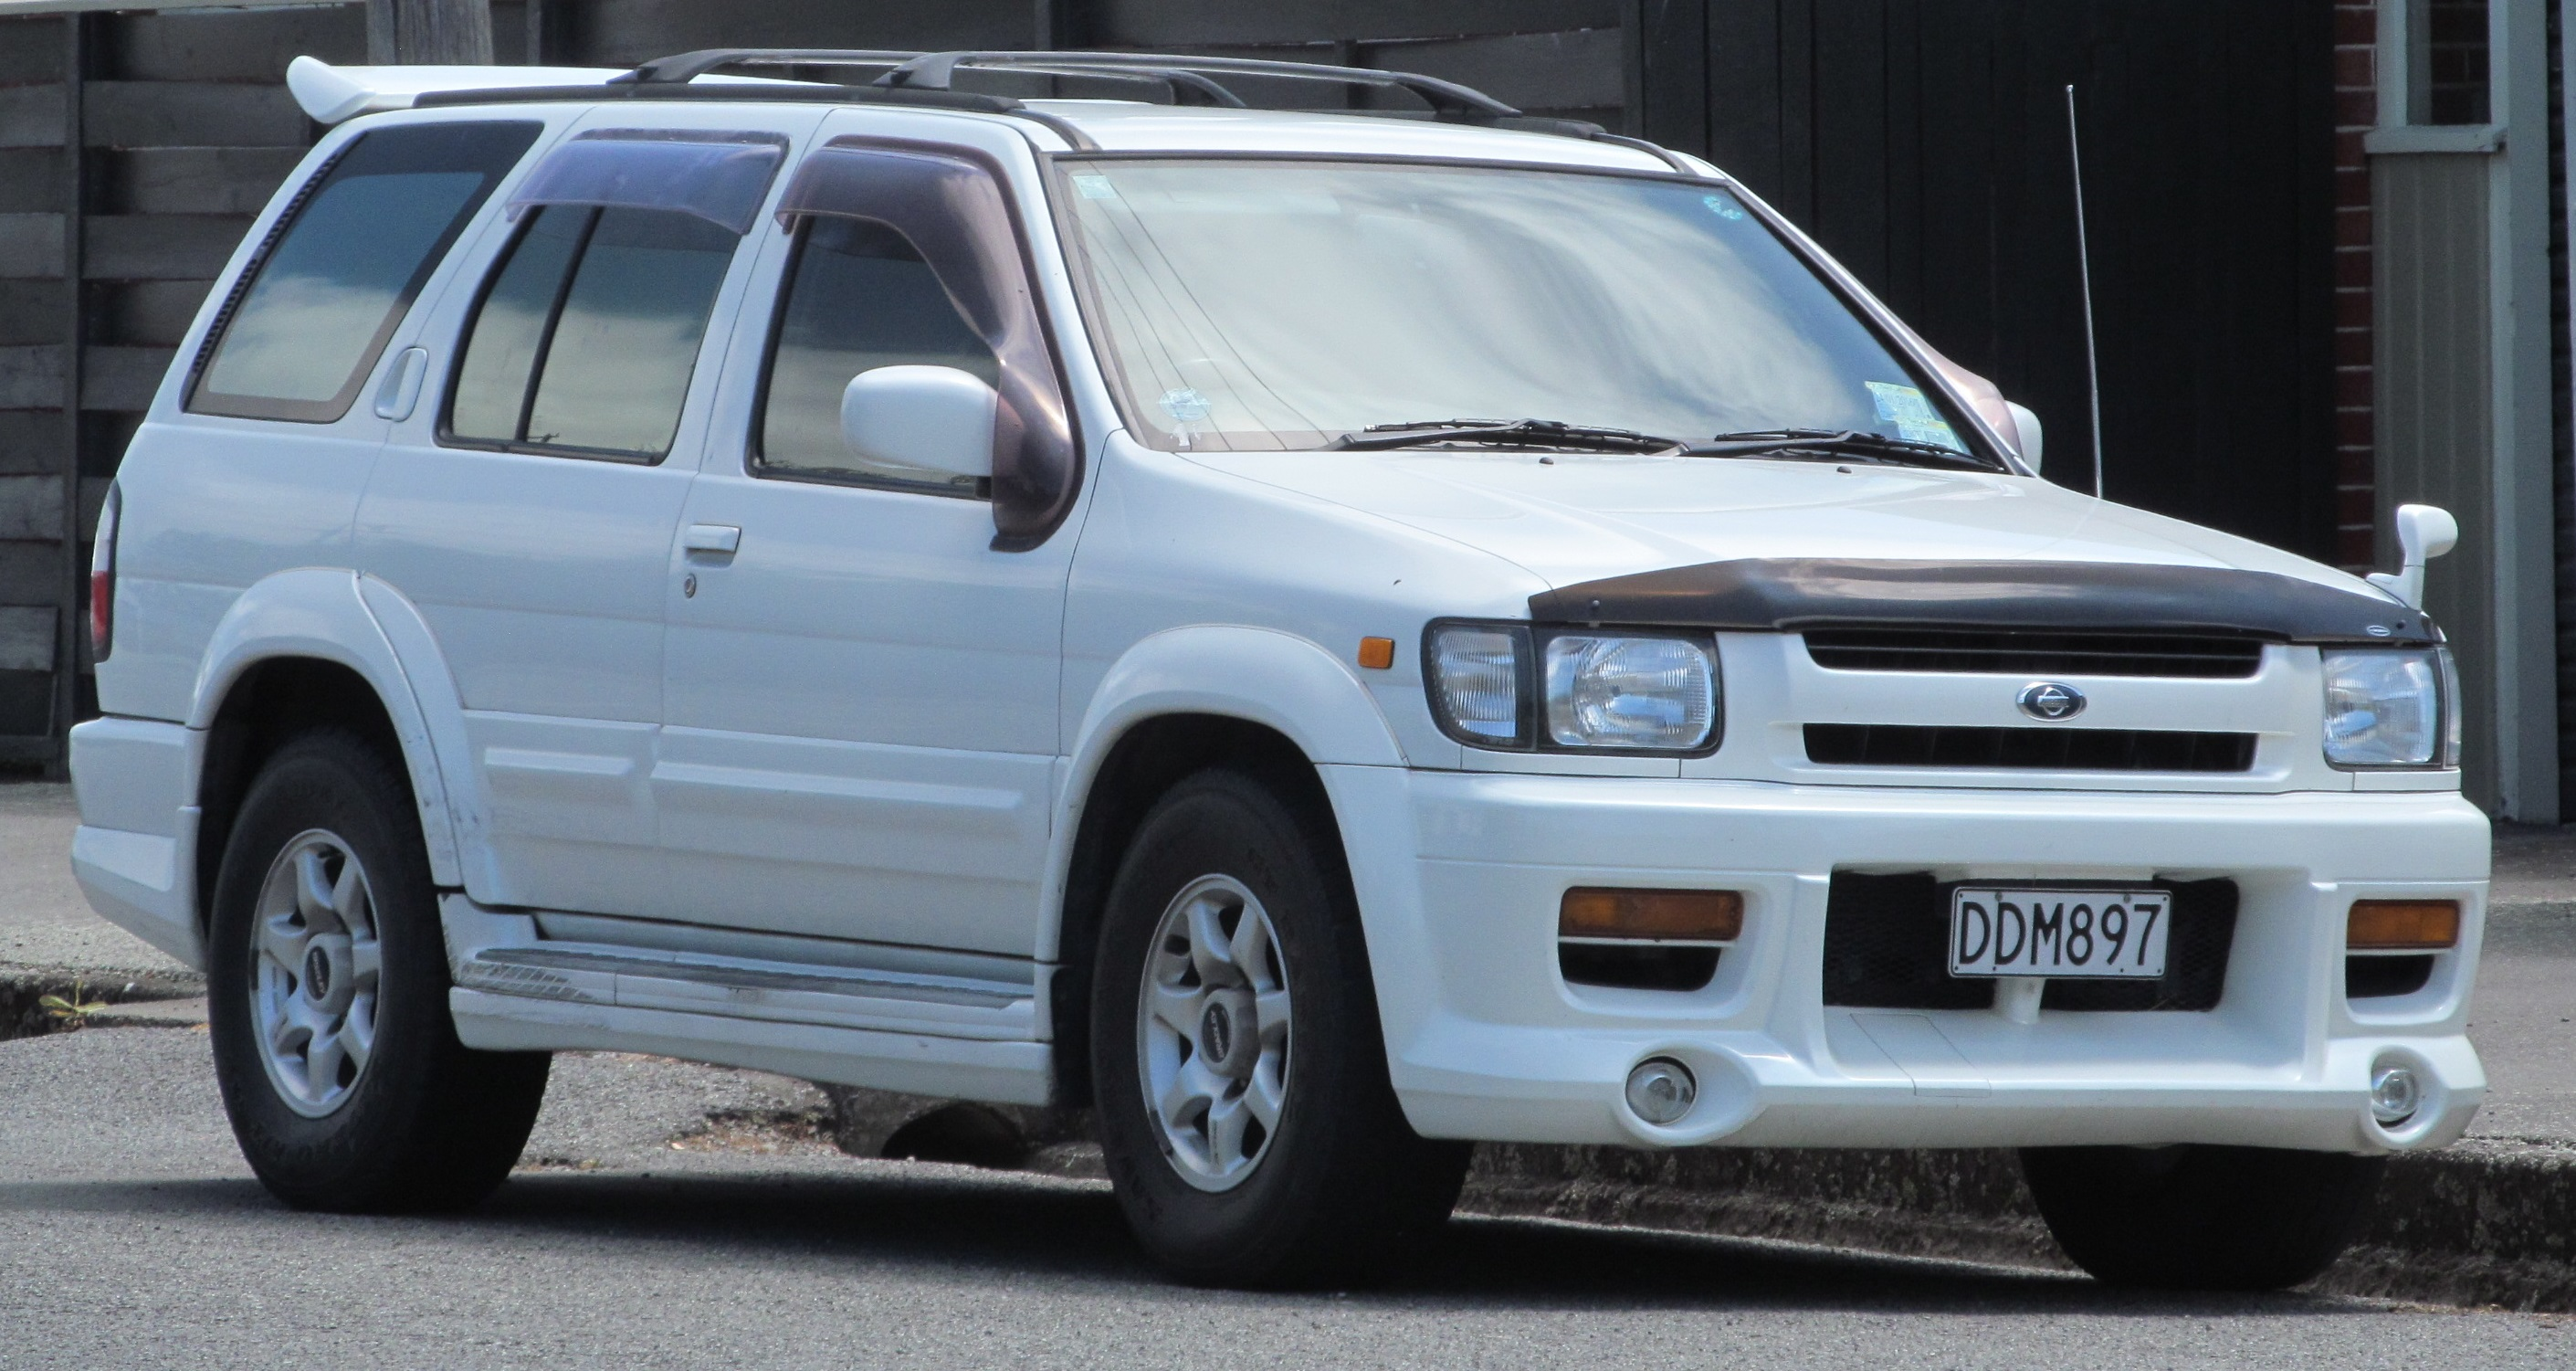 File:Nissan Terrano Regulus Starfire  The Regulus Starfire